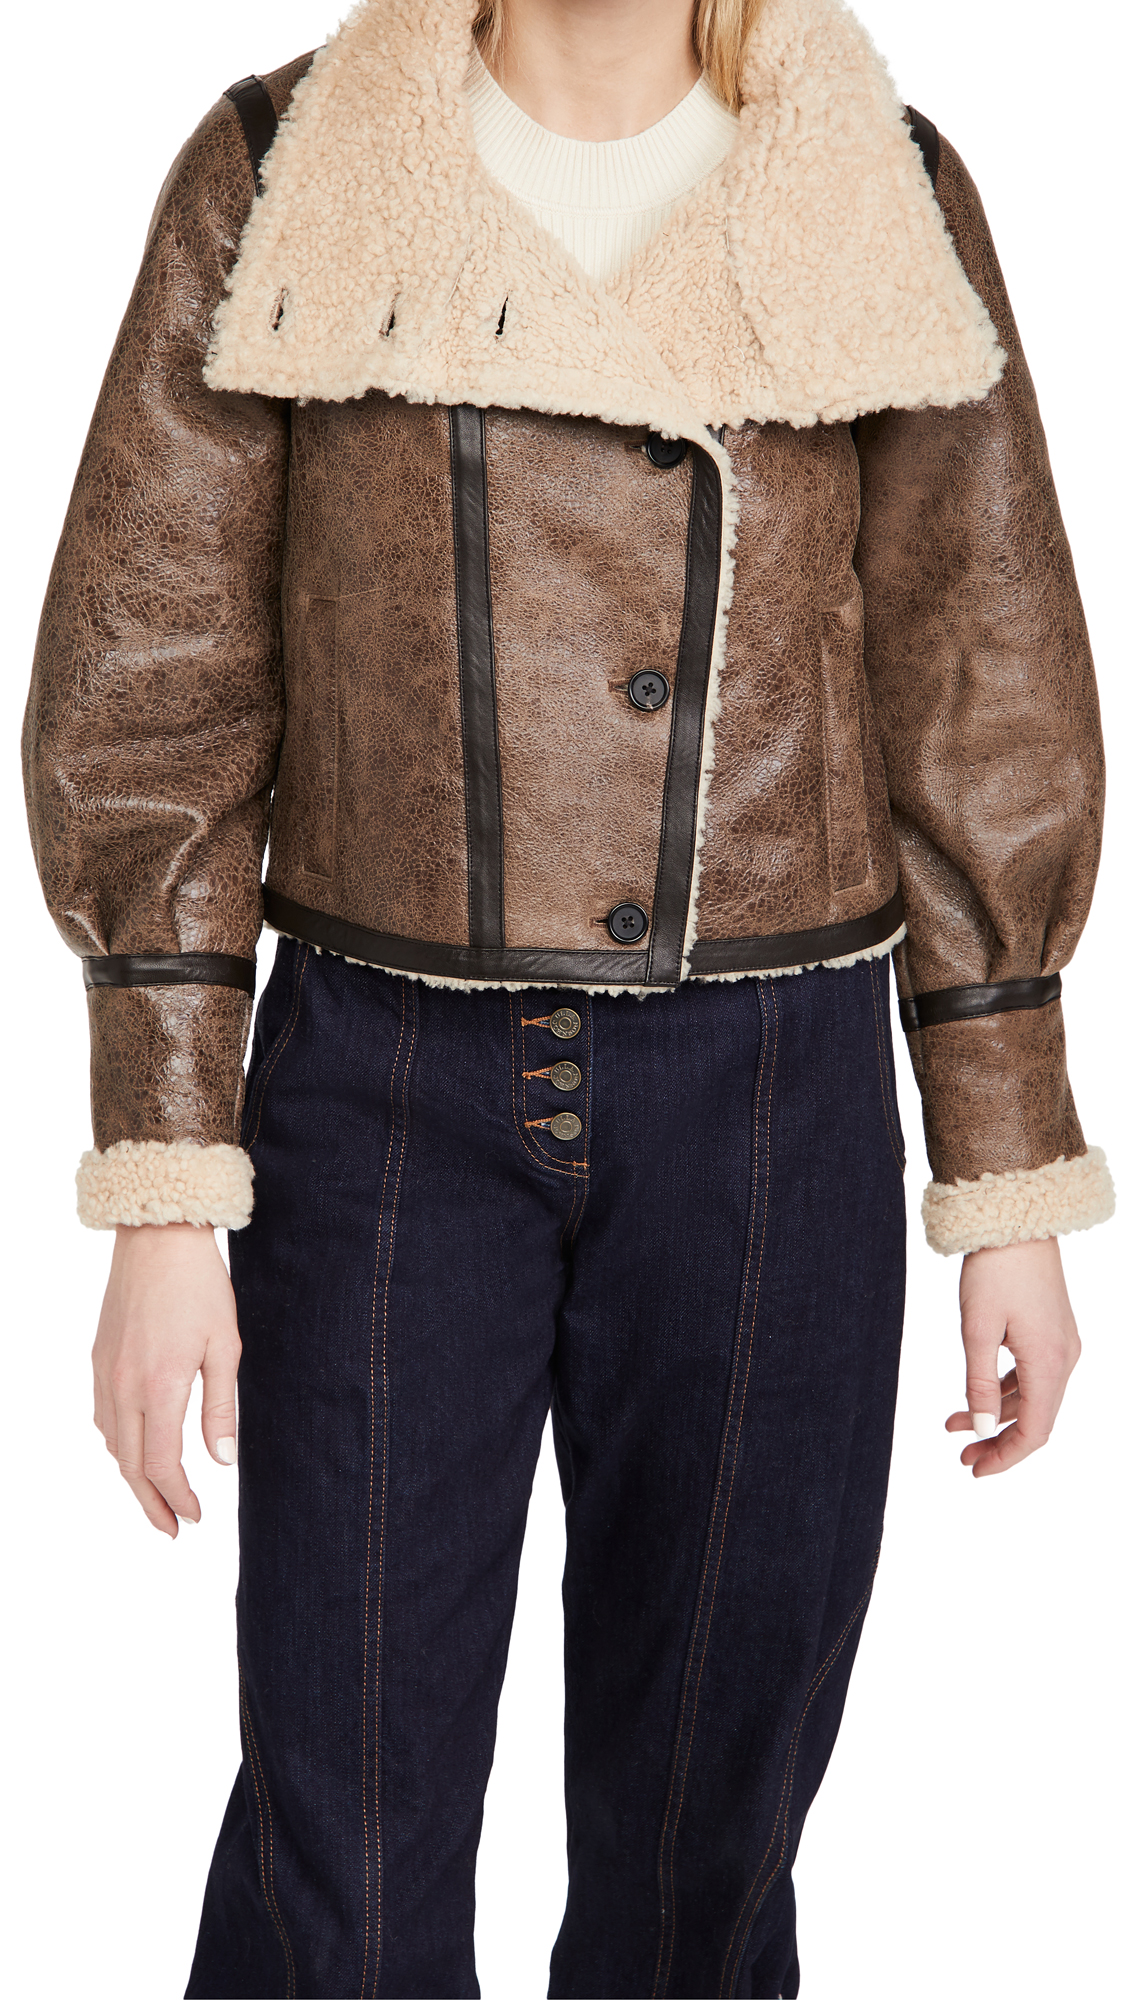 Veronica Beard Selita Shearling Jacket